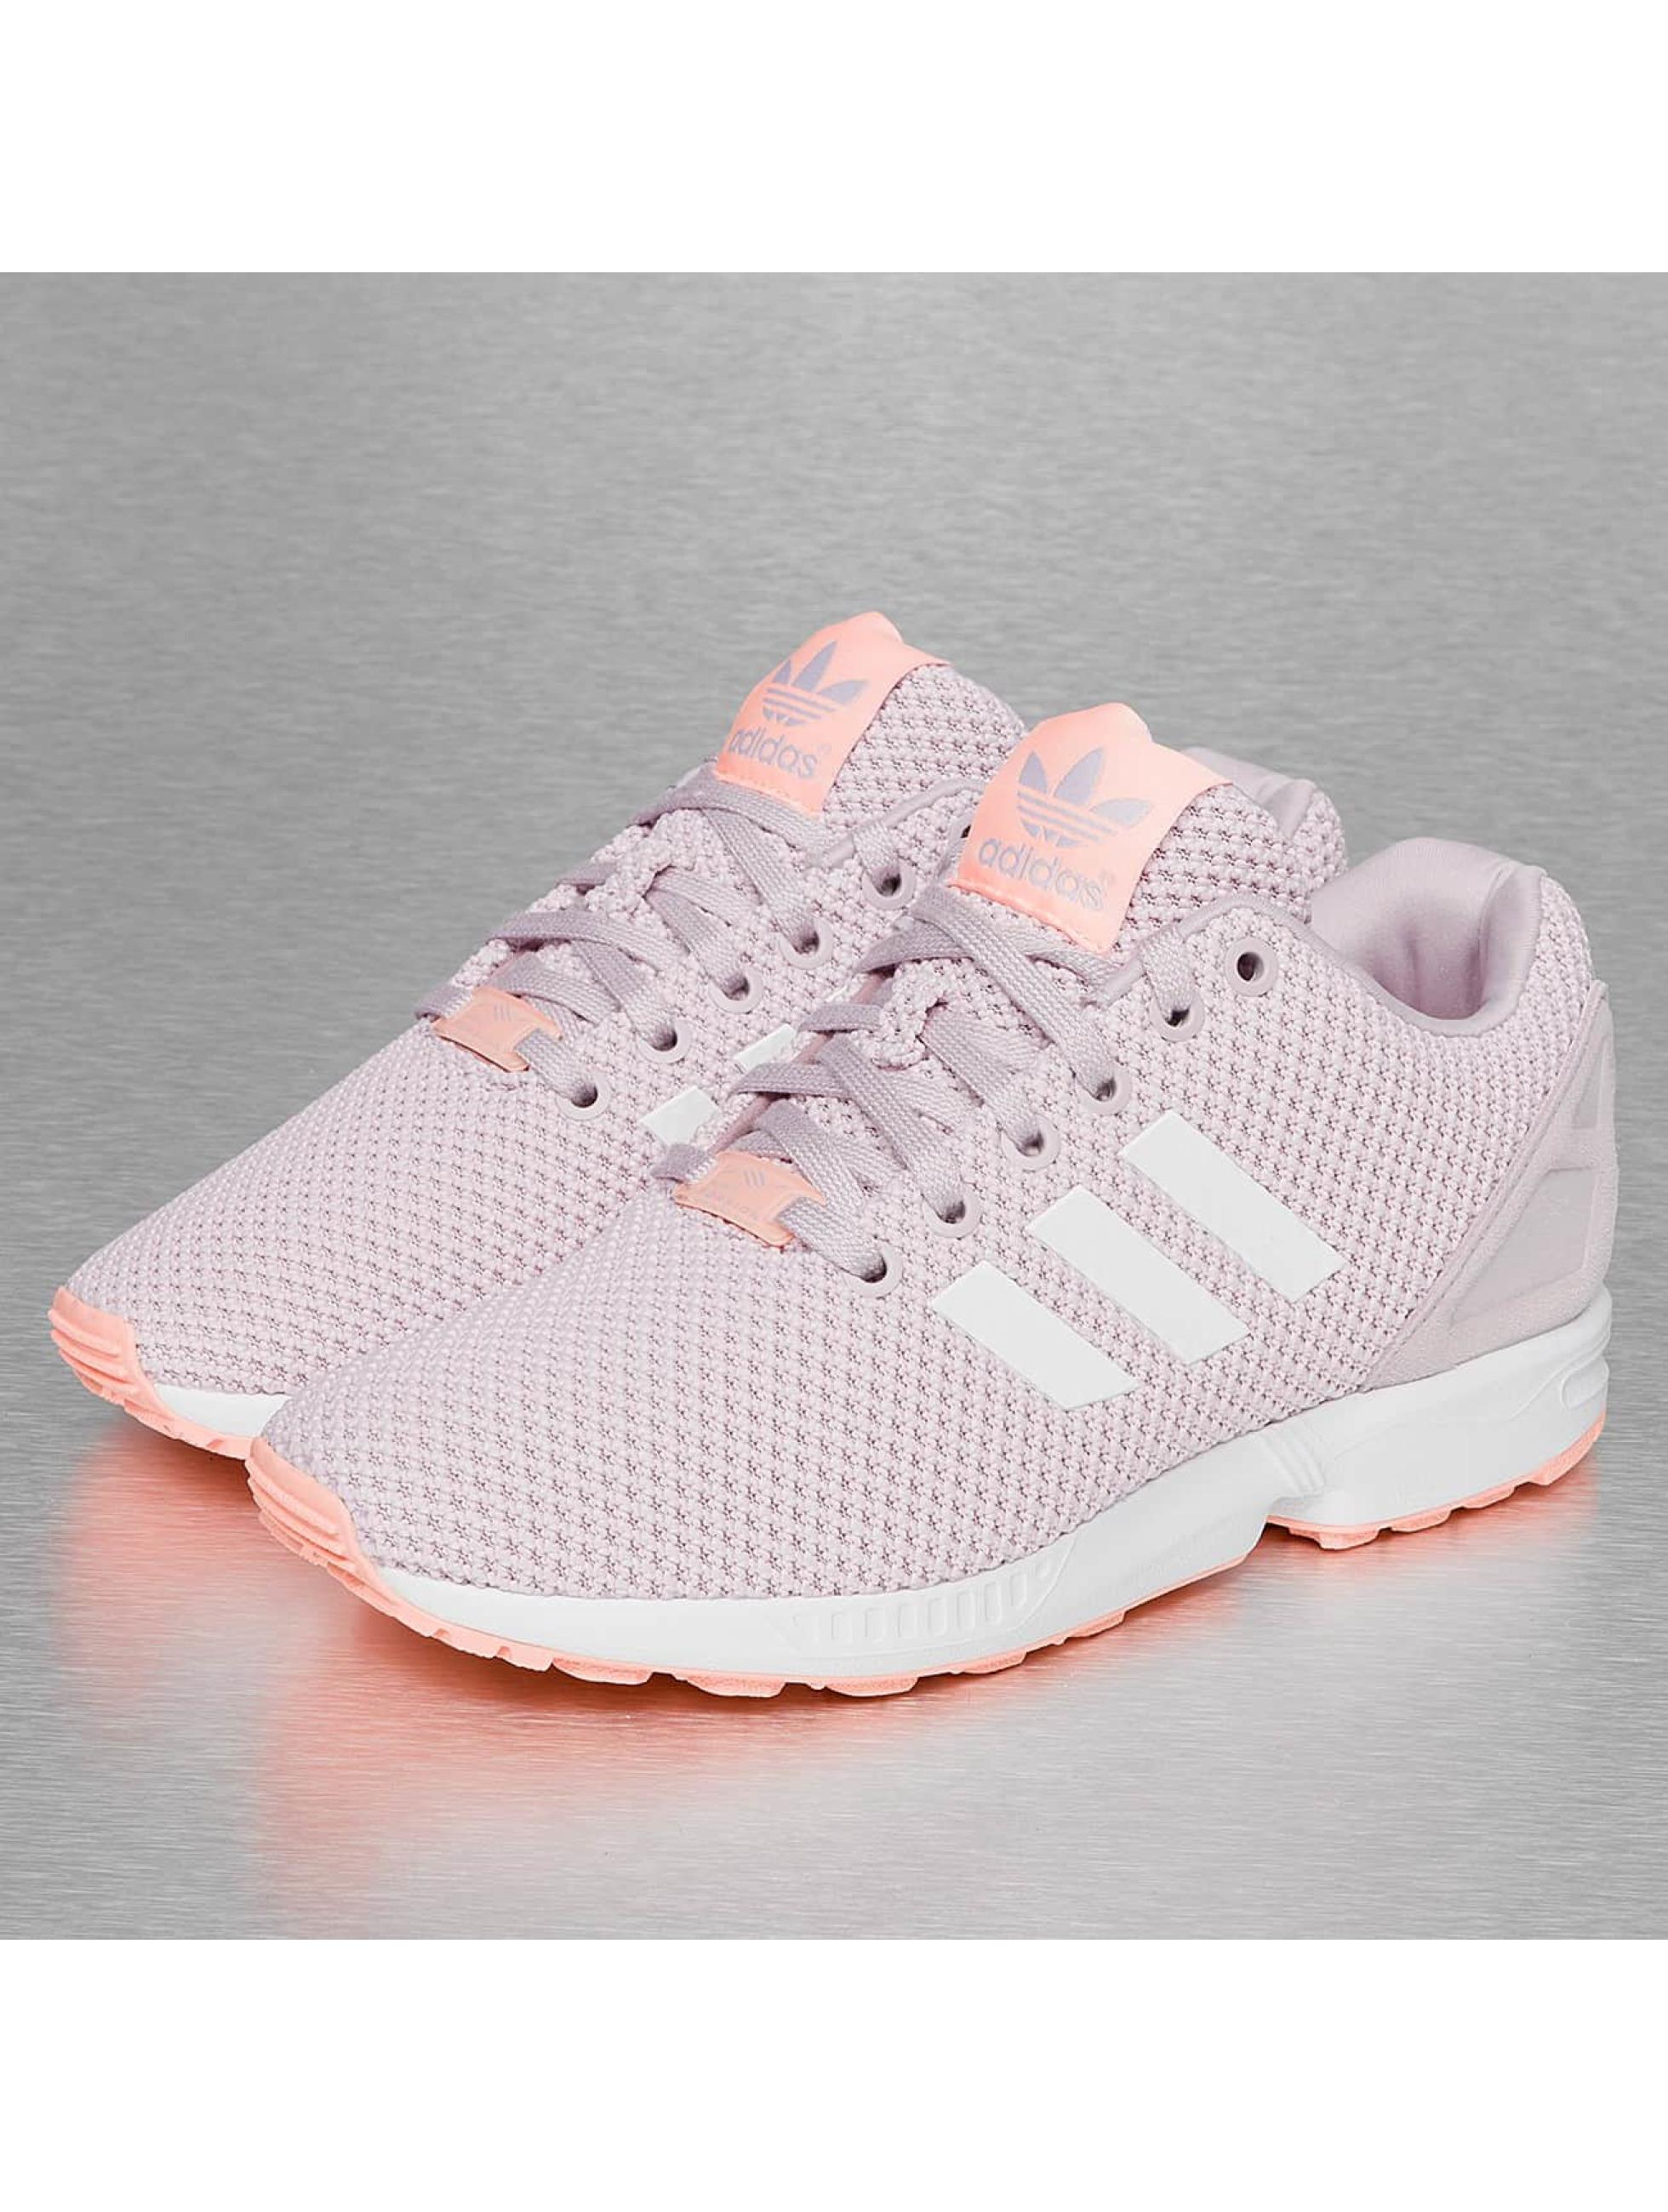 Adidas Zx Flux Rose Pale